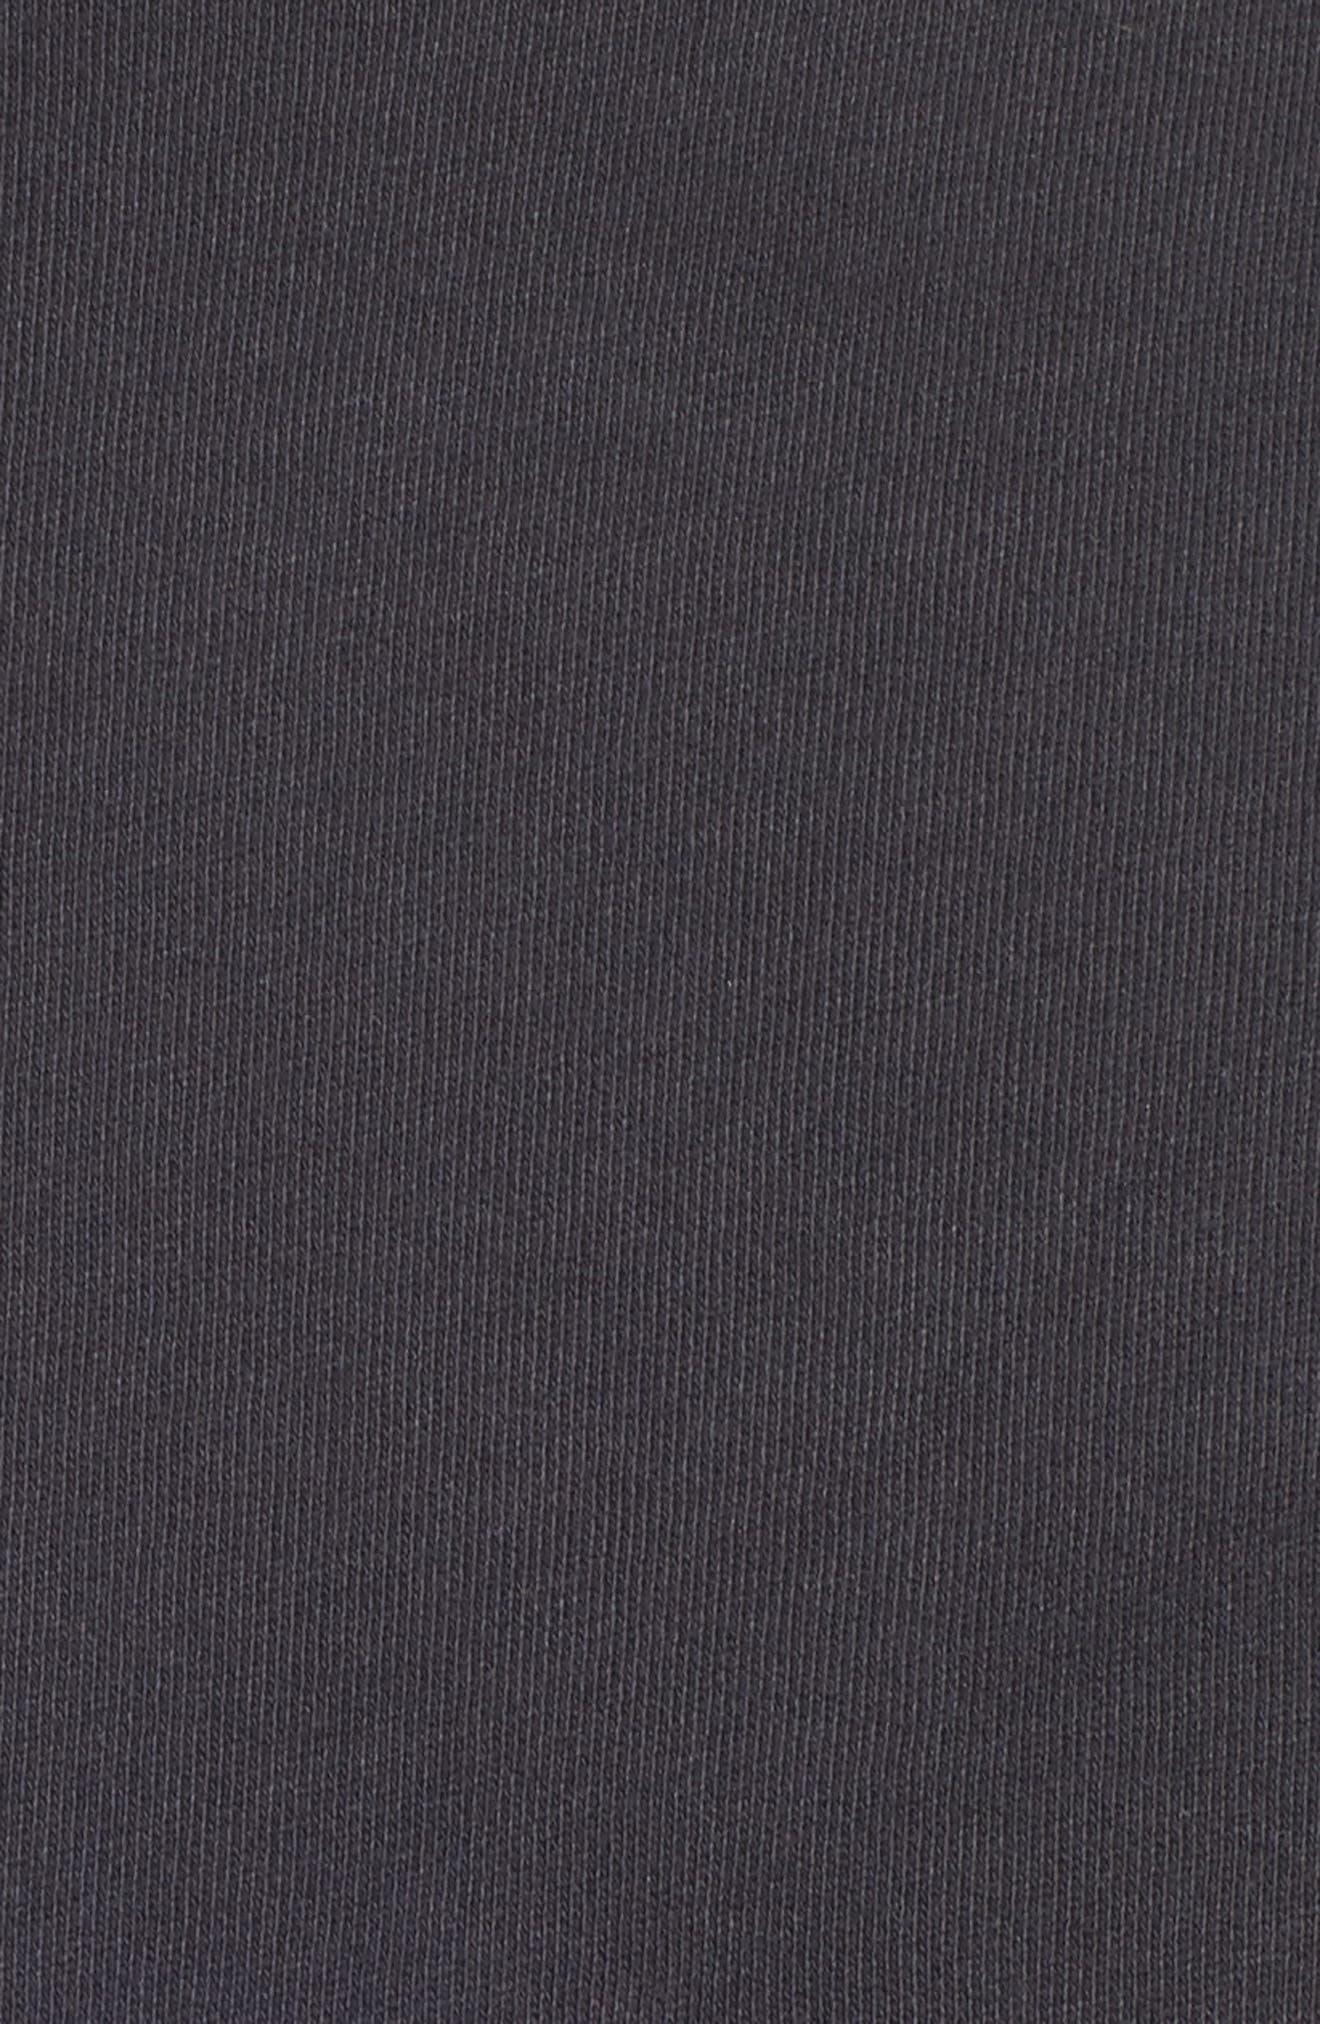 Alexa - Splash Sweatshirt,                             Alternate thumbnail 5, color,                             001